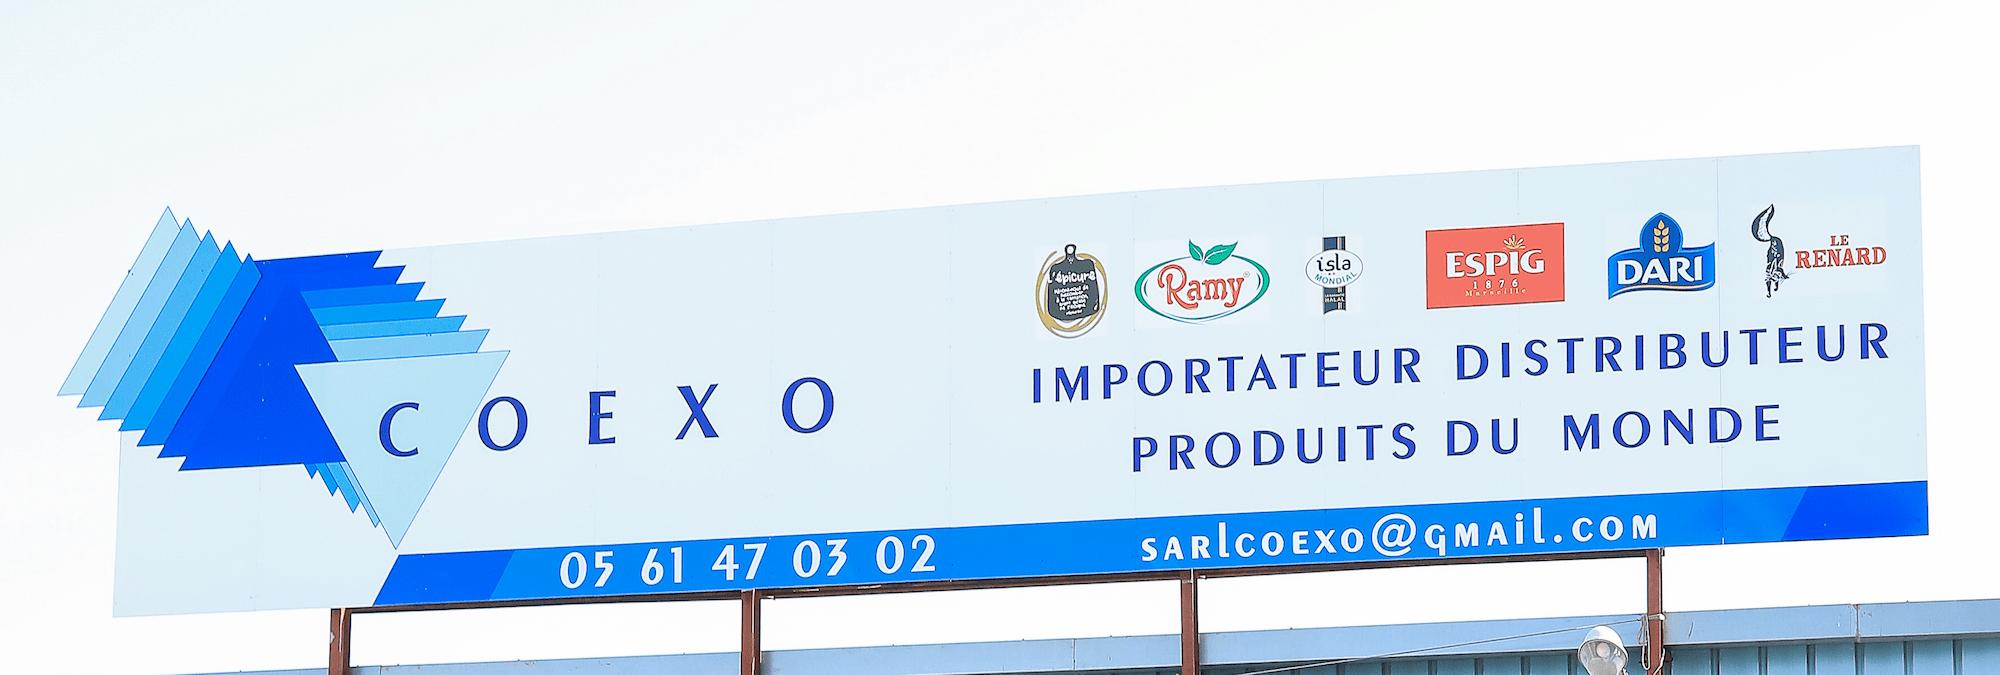 Coexo_presentation